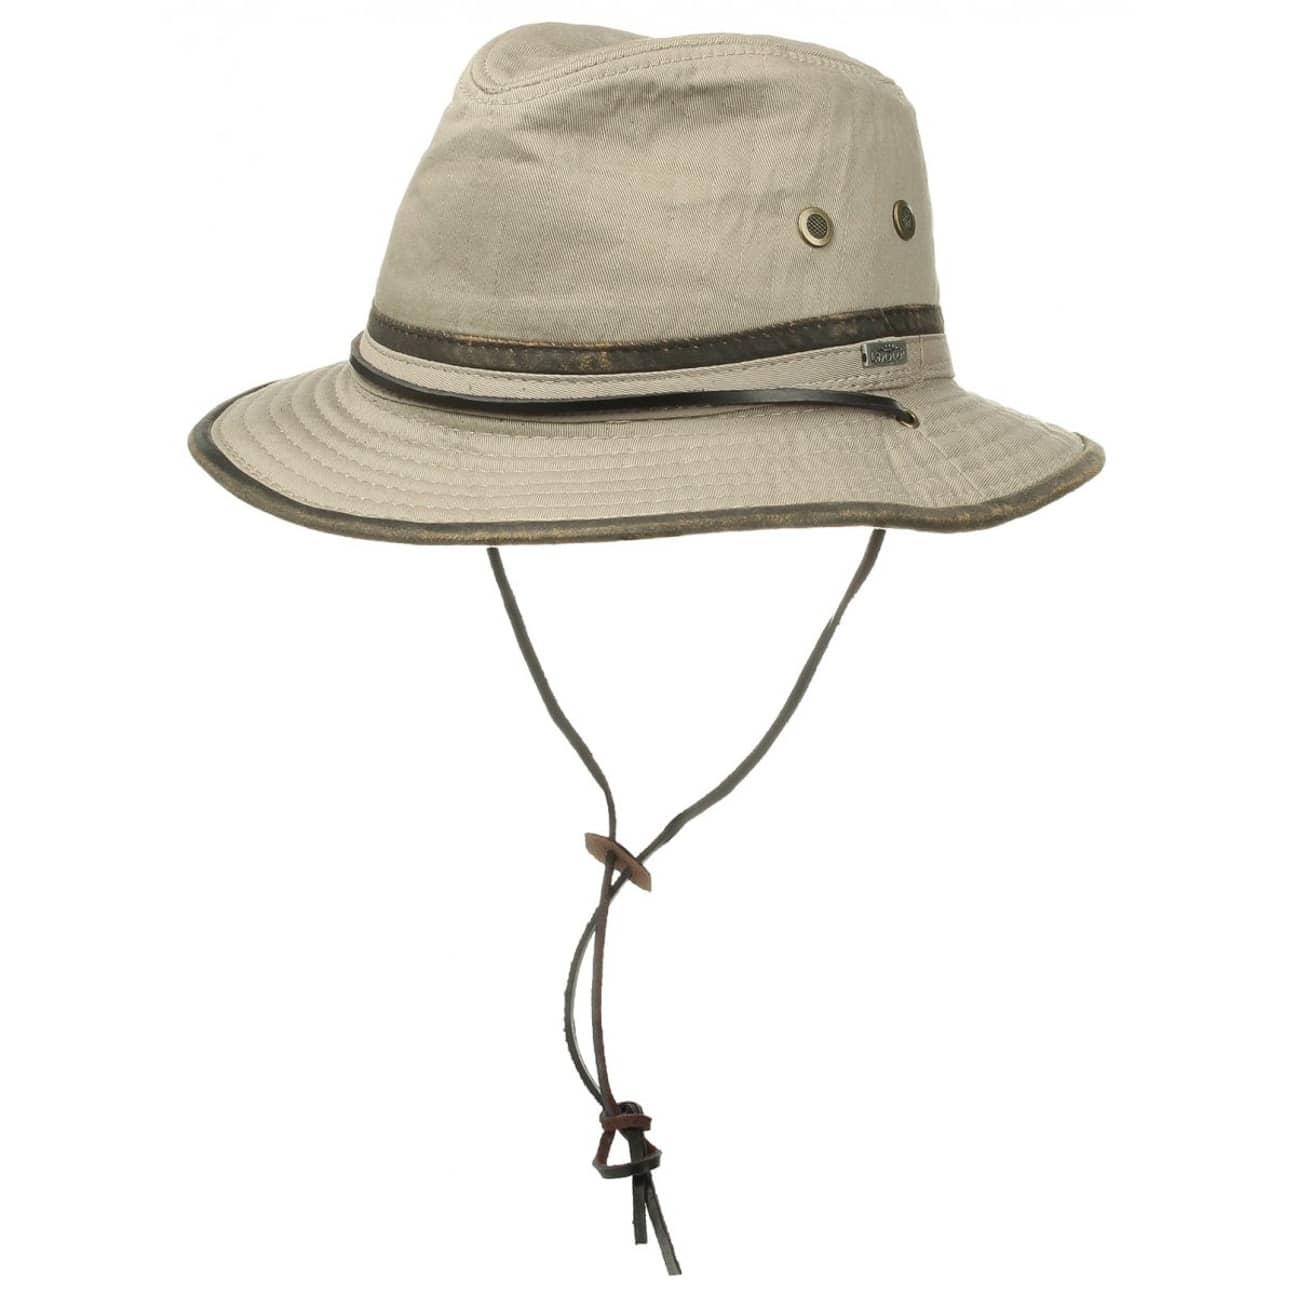 Chapeau Bamboobio Outdoor by Conner  chapeau aventurier